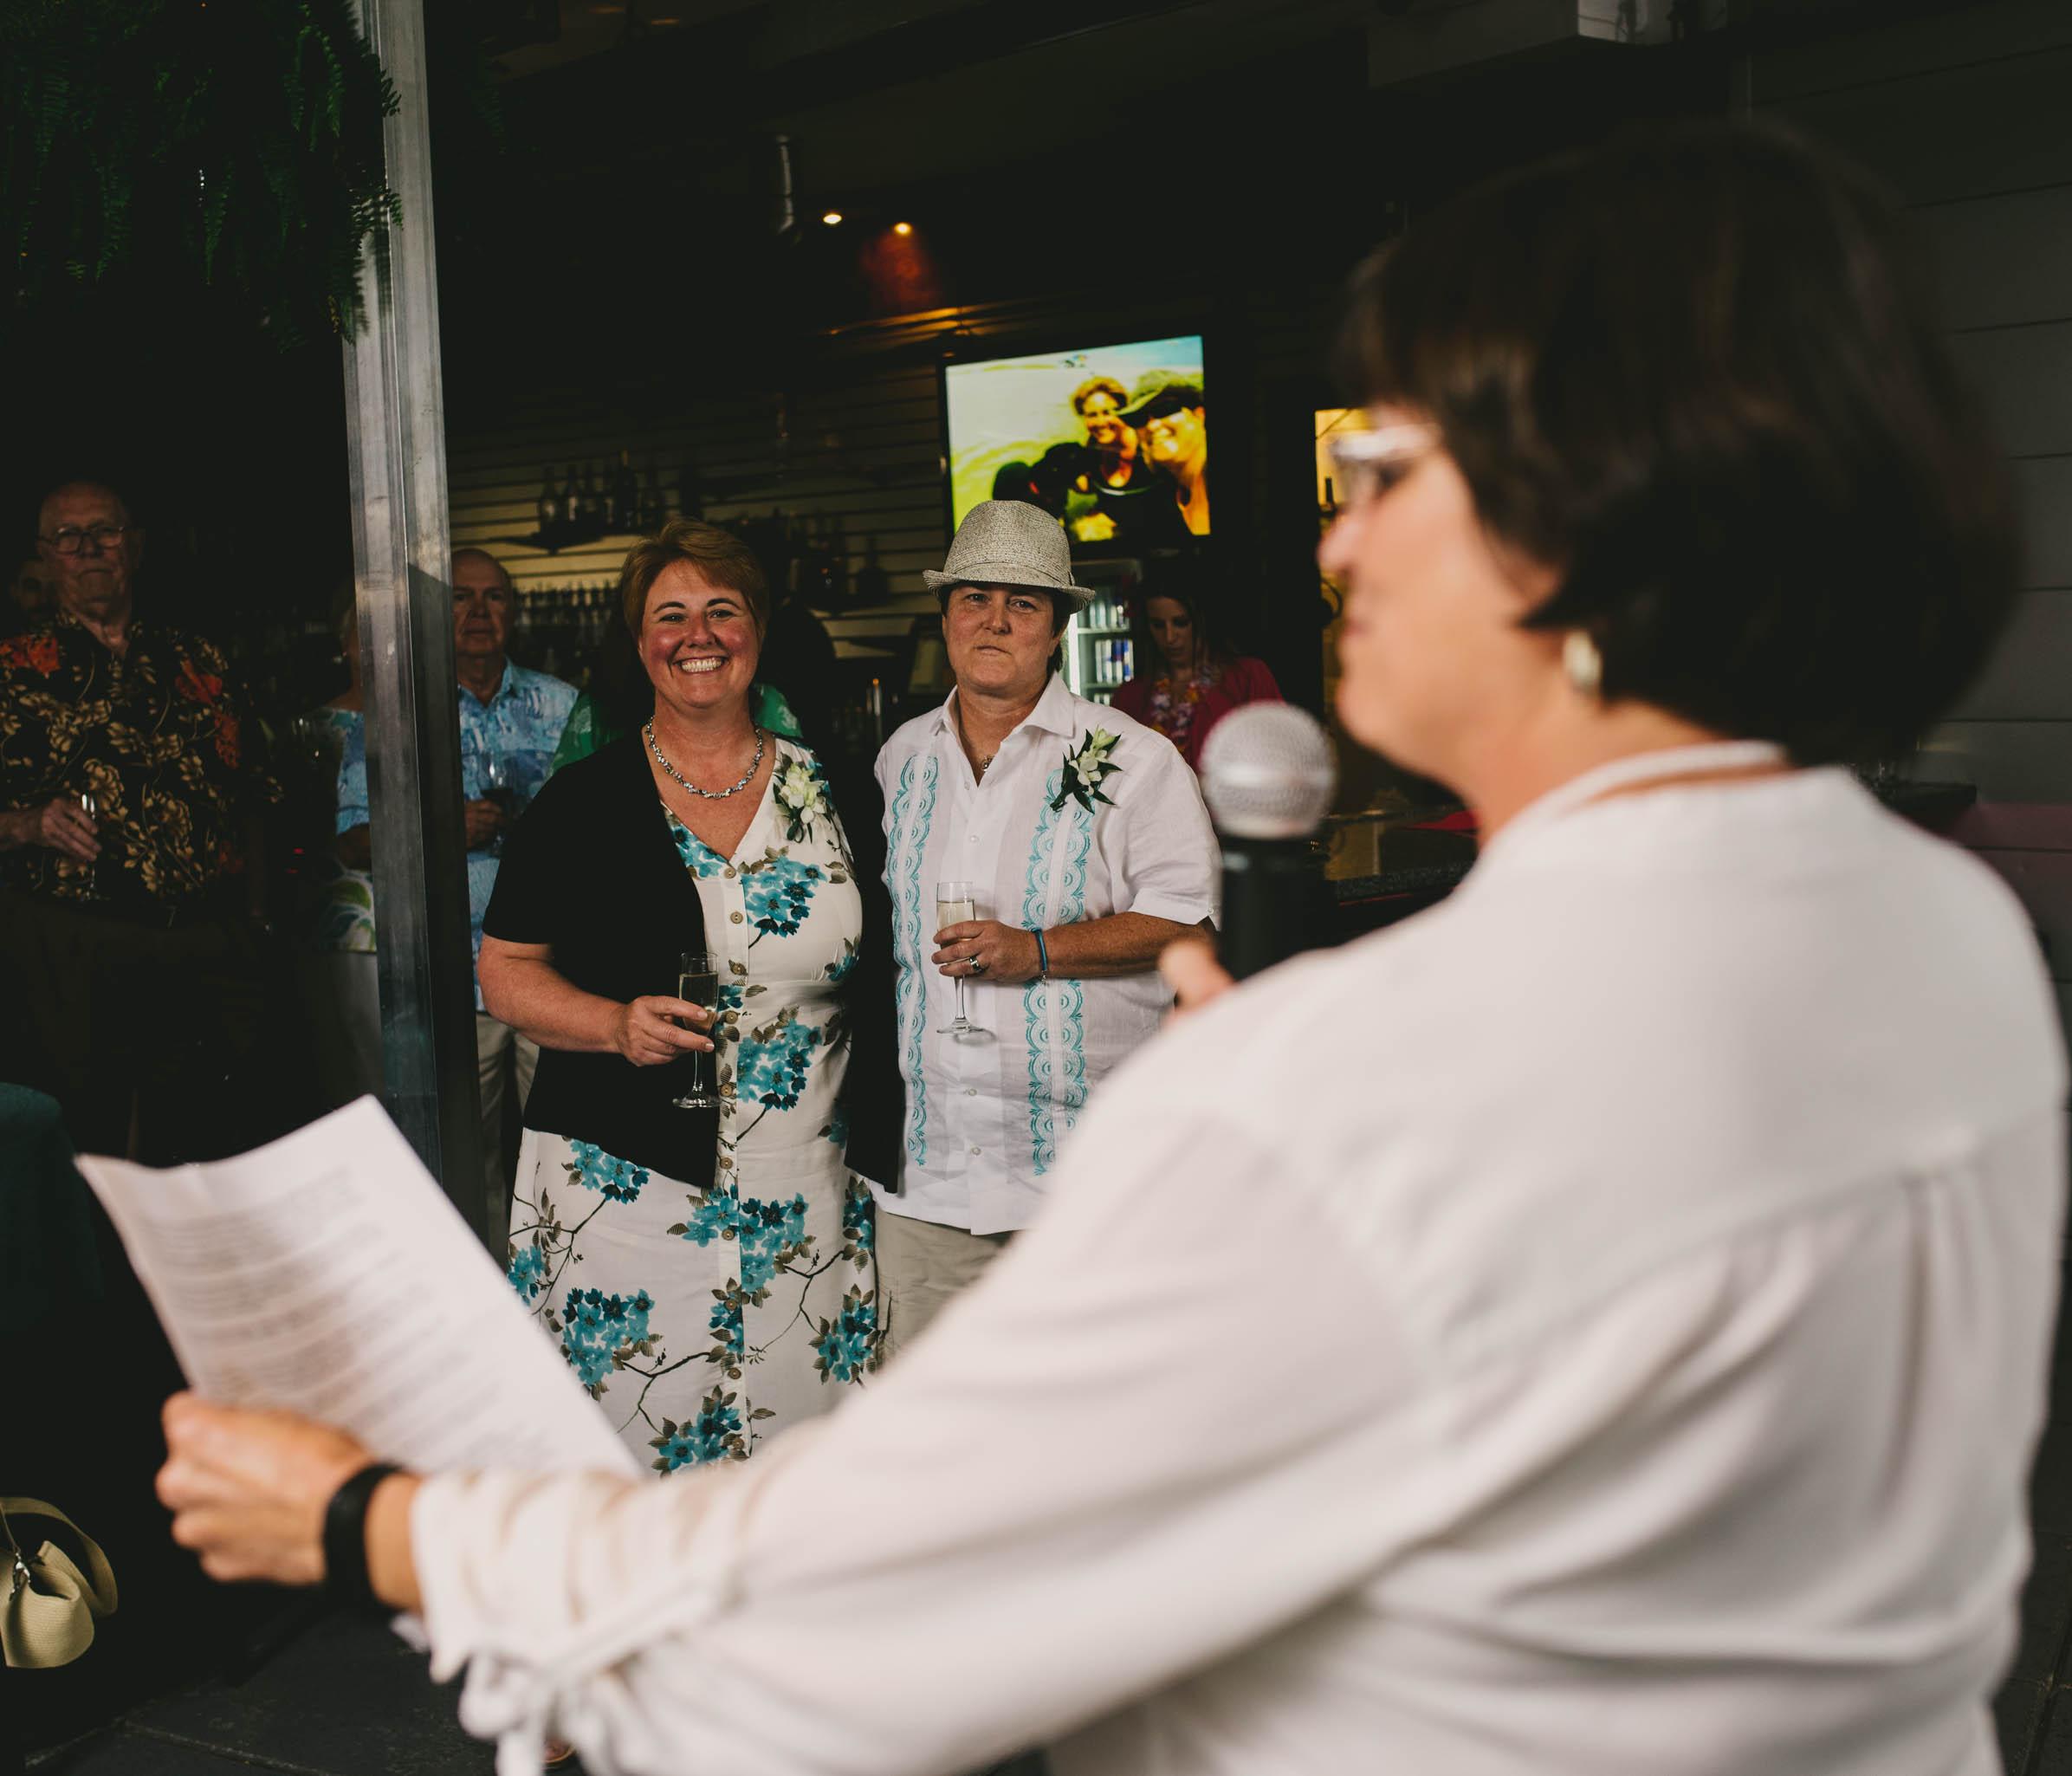 solas-restaurant-raleigh-same-sex-wedding-toasts-photo.jpg